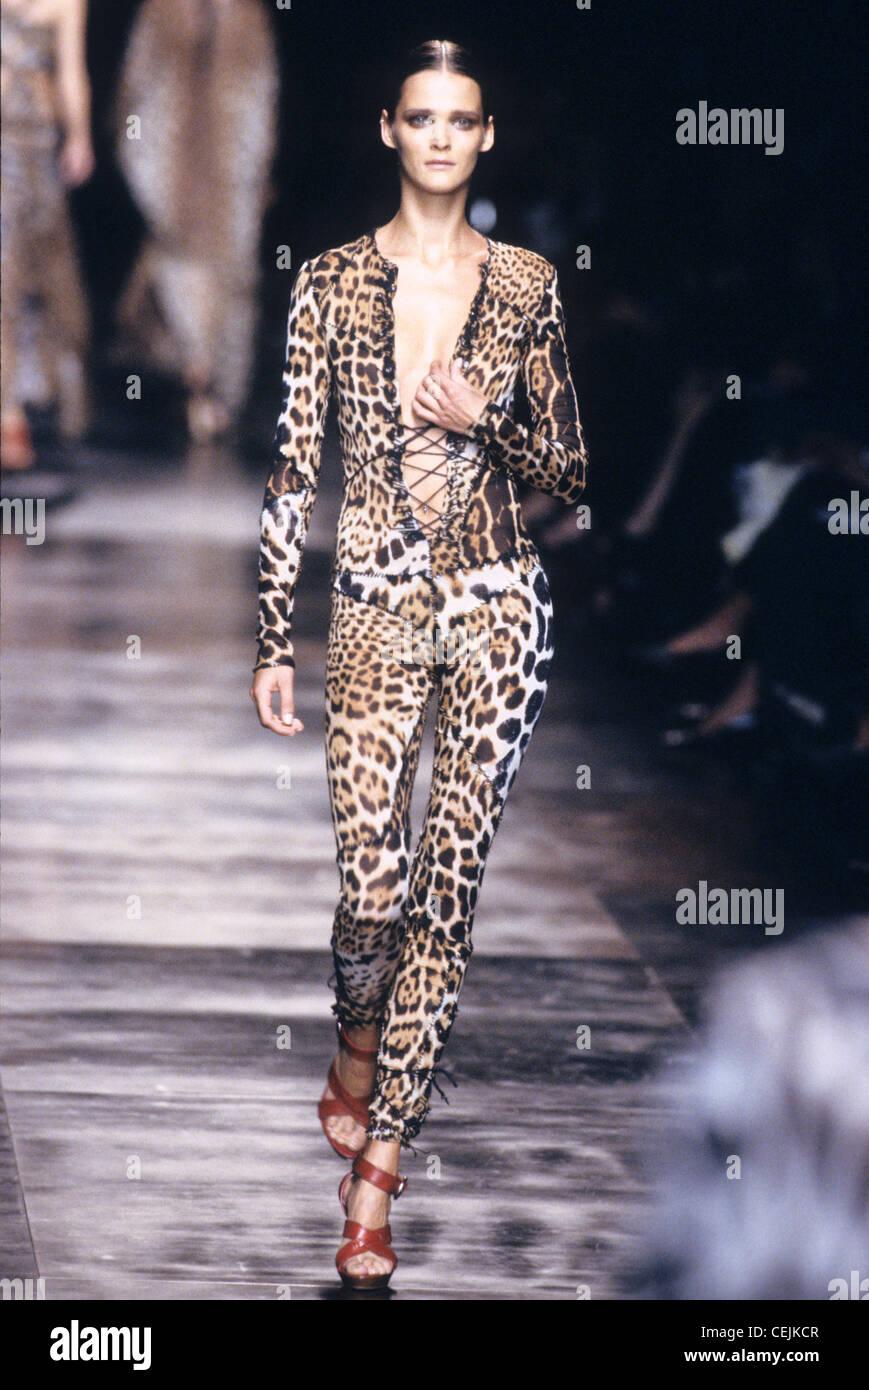 e167b814fb8 Yves Saint Laurent Spring Summer Estonian model Carmen Kass wearing laceup  brown leopard print catsuit